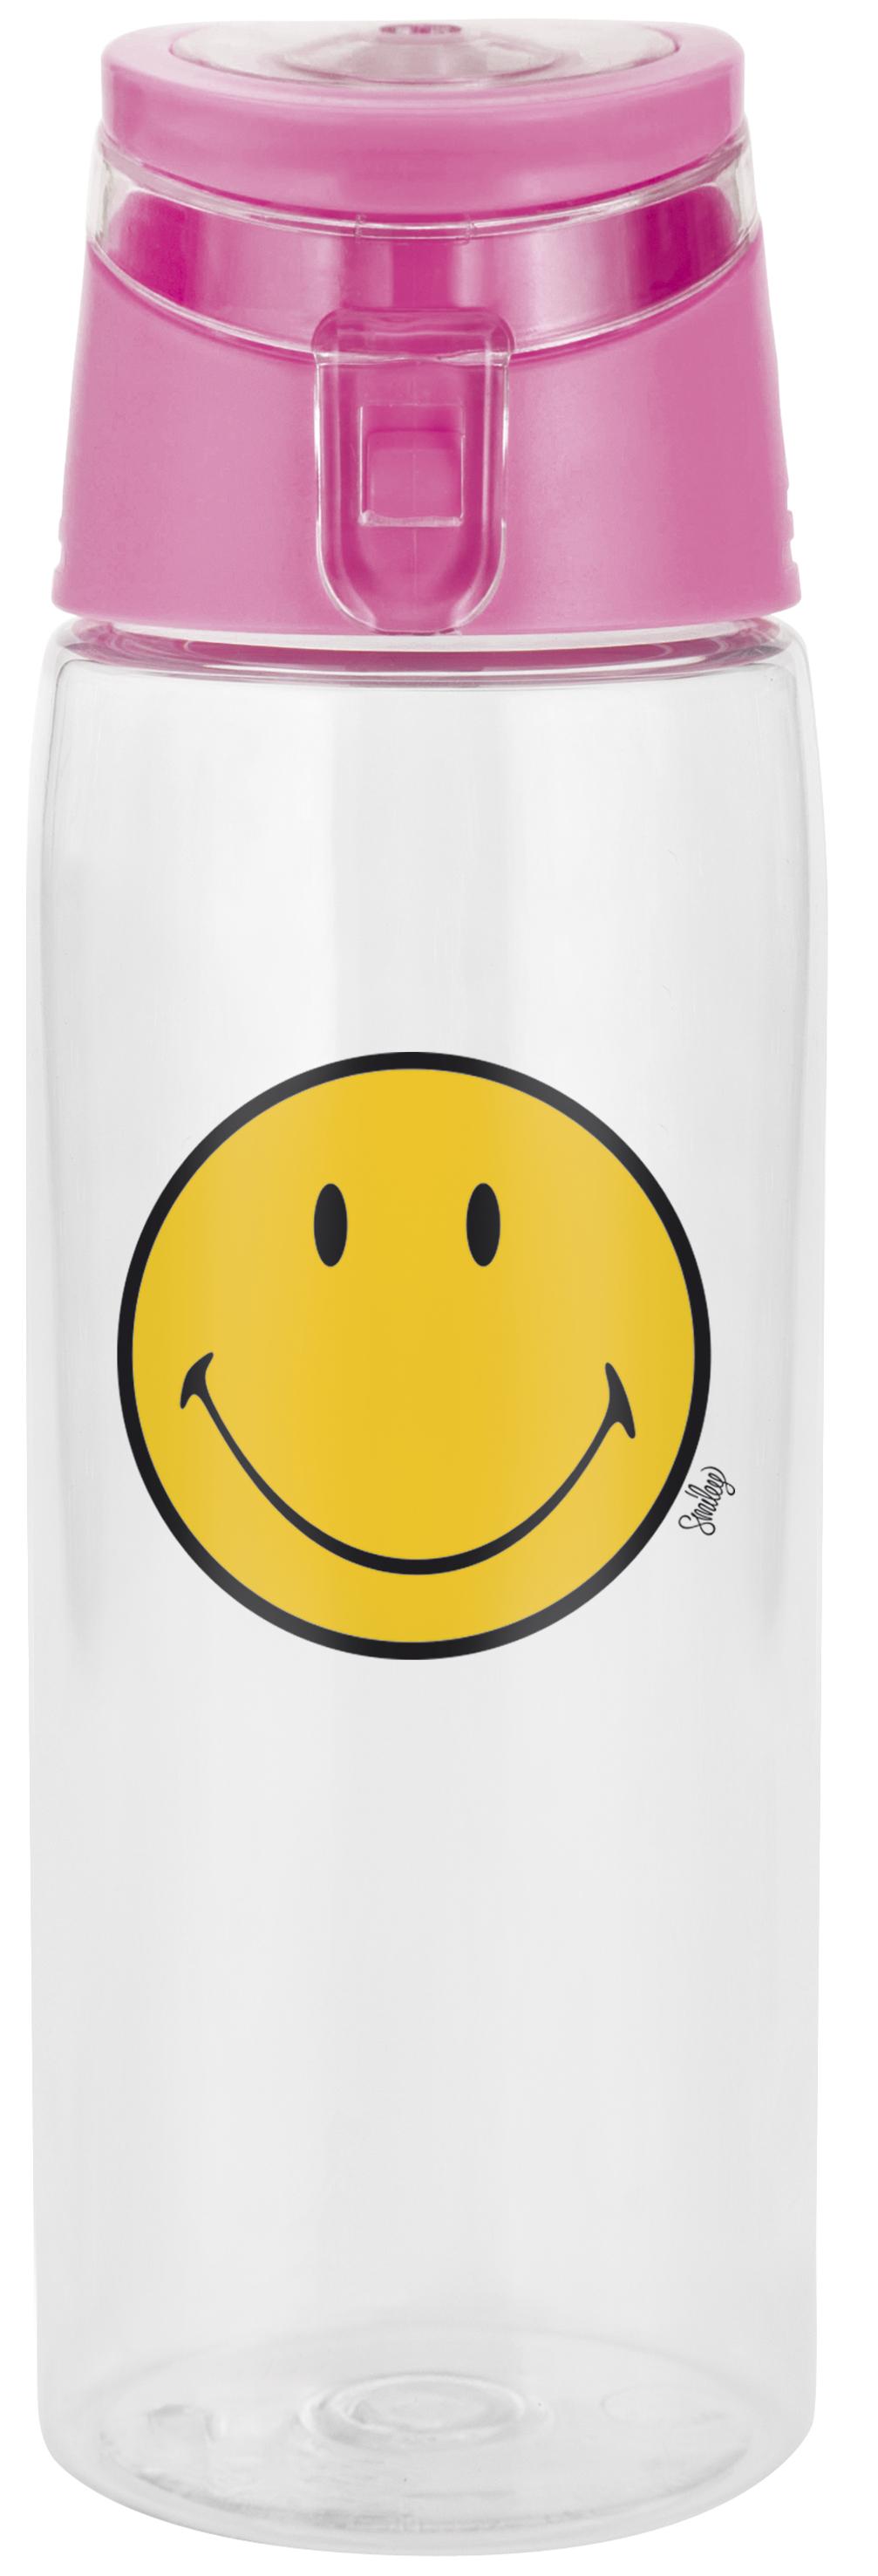 Sticluta pentru copii Smiley Bootle Transparent/Magenta, 750 ml imagine